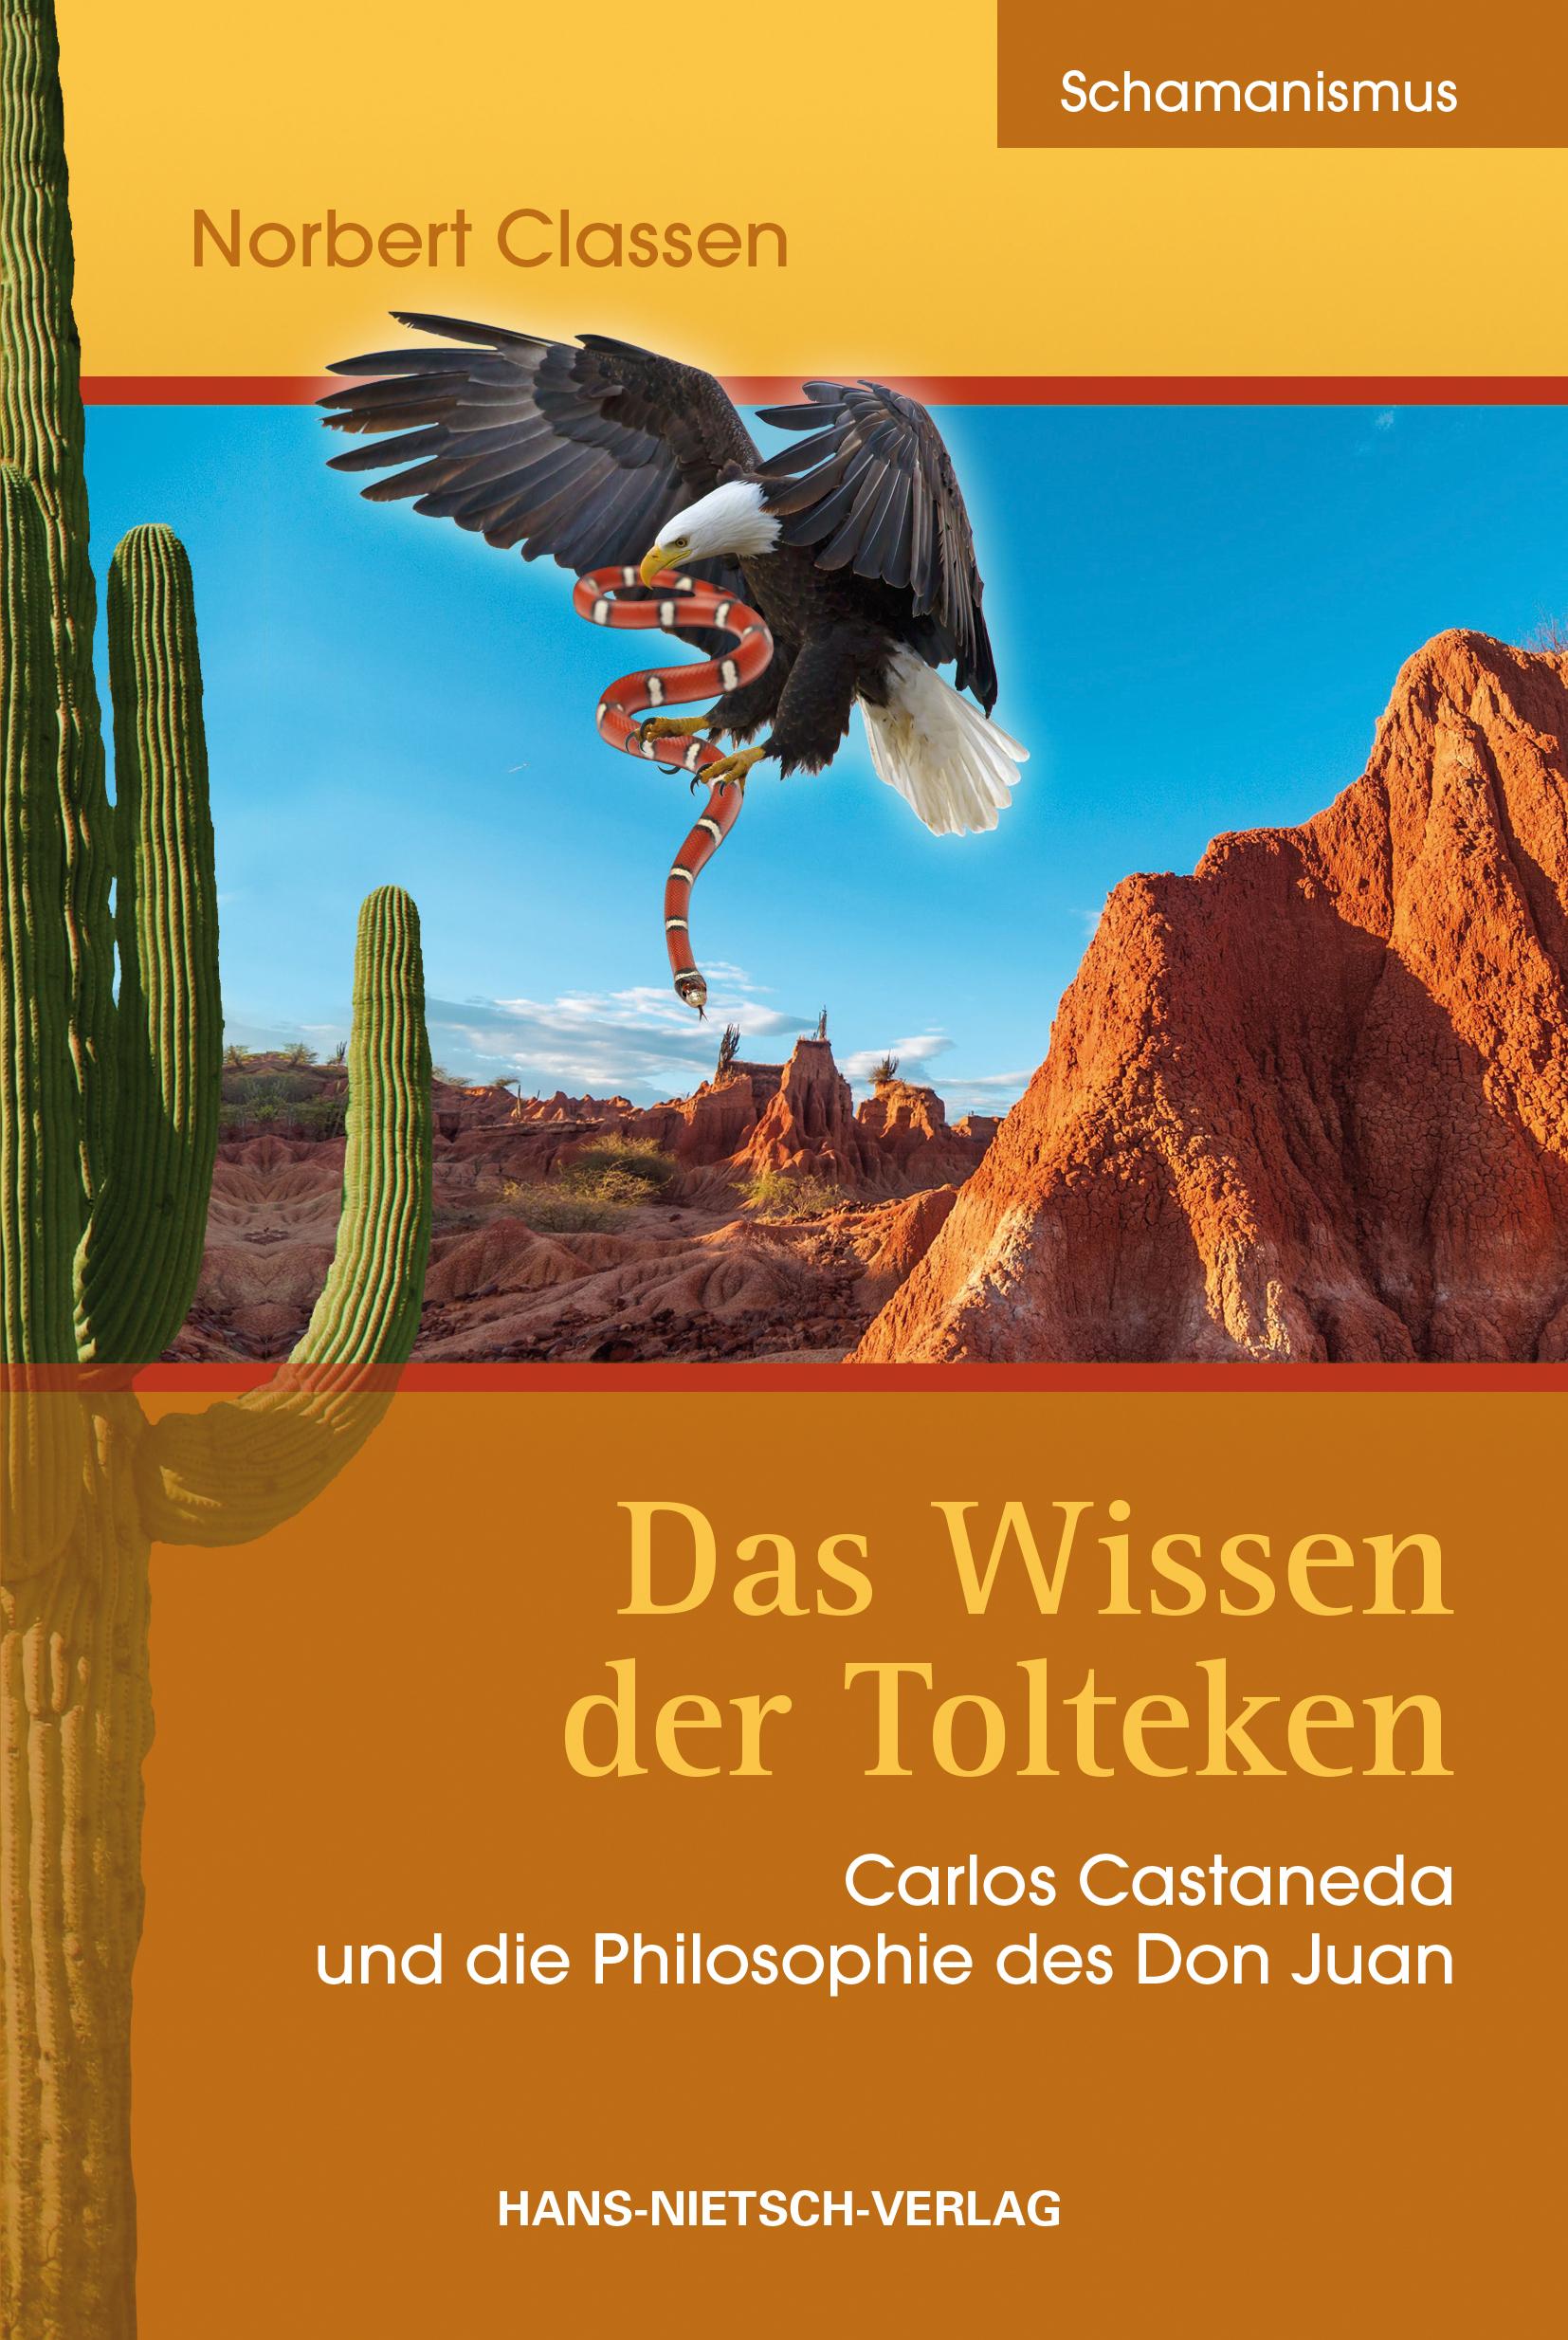 Das Wissen der Tolteken - Norbert Classen